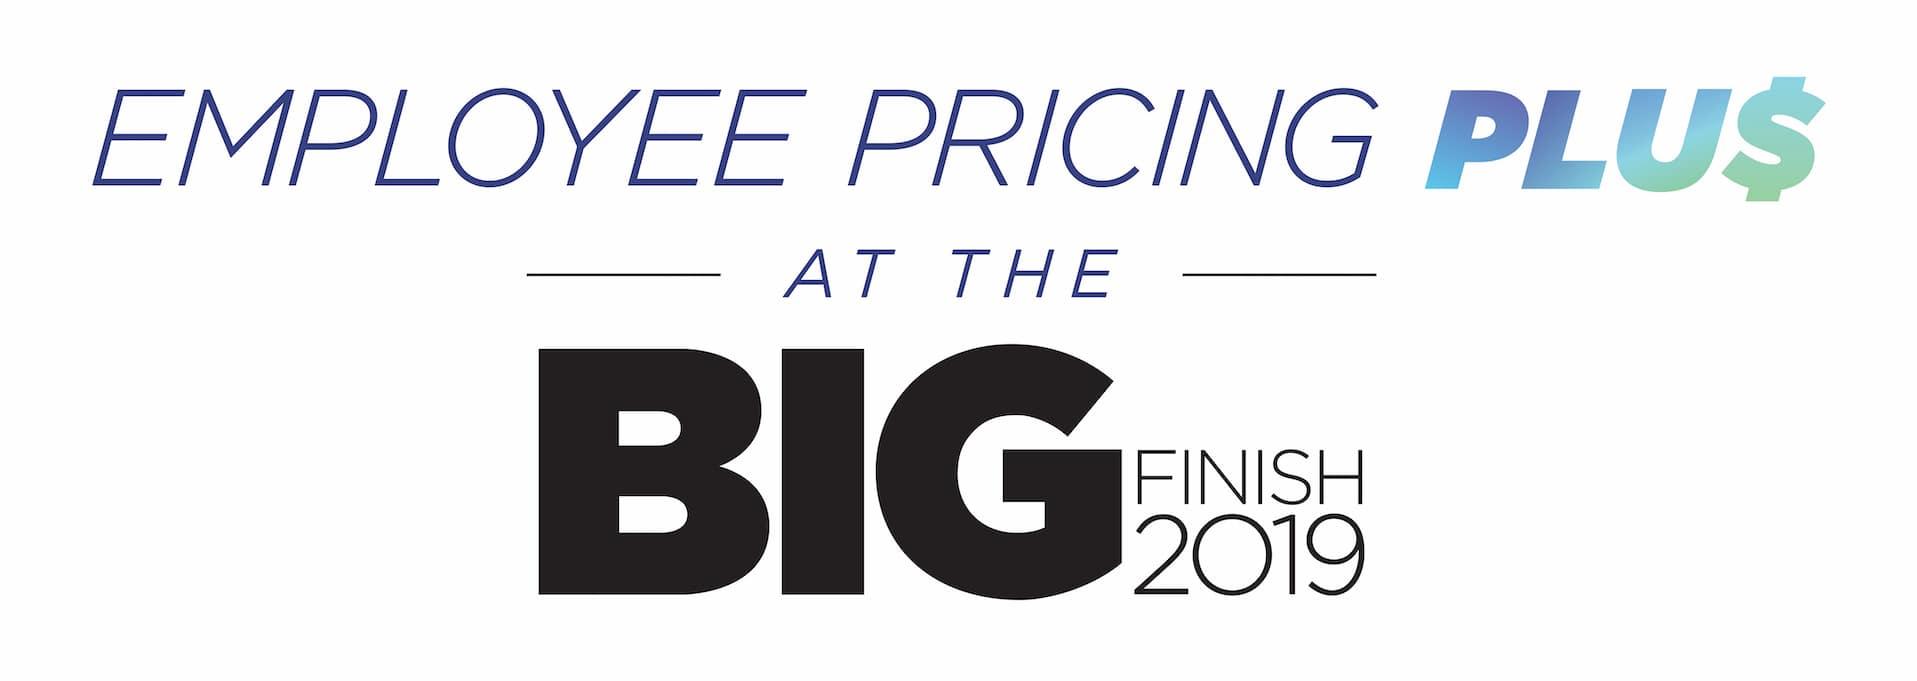 Employee Pricing Big Finish 2019